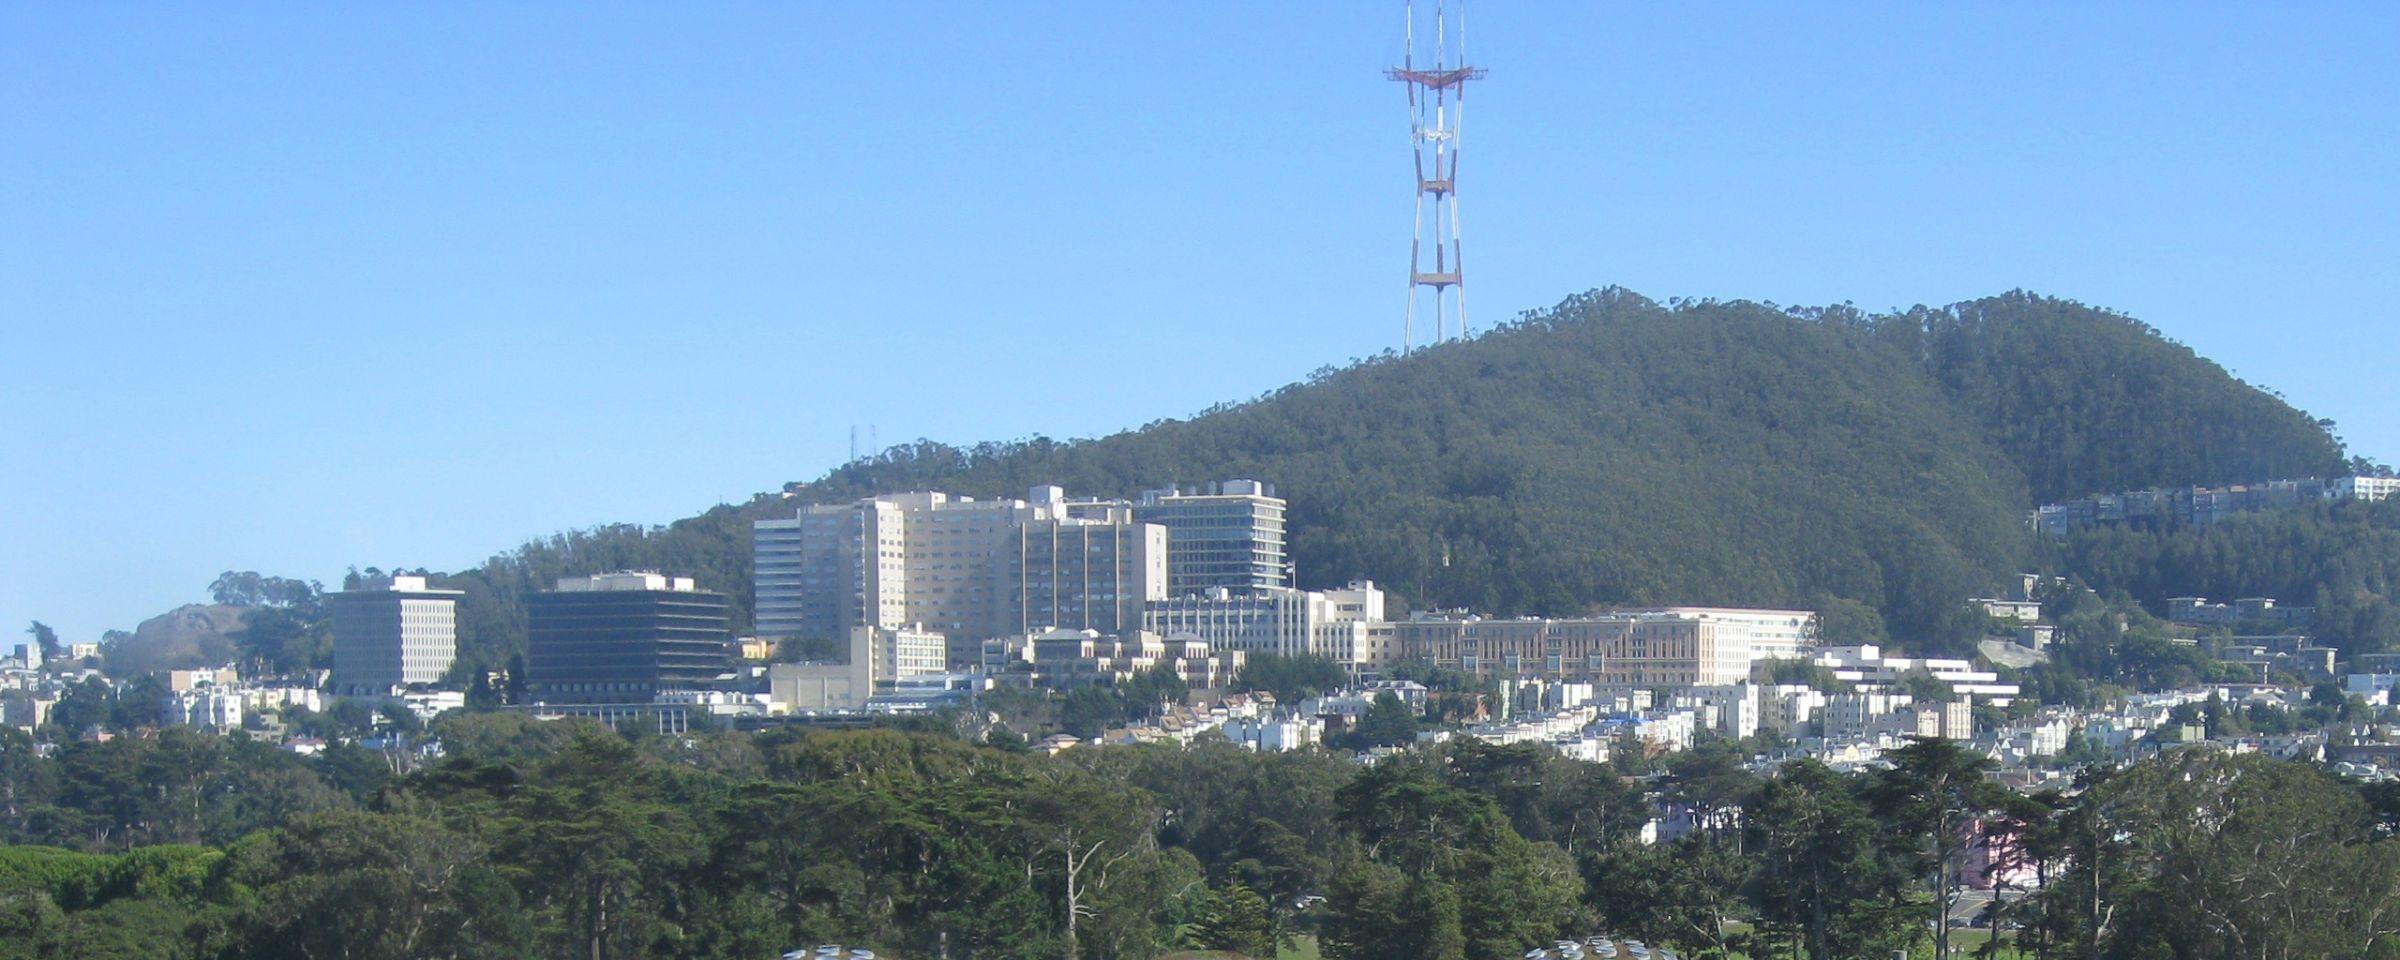 University_of_California_San_Francisco_School_of_Medicine_UCSF_5655751